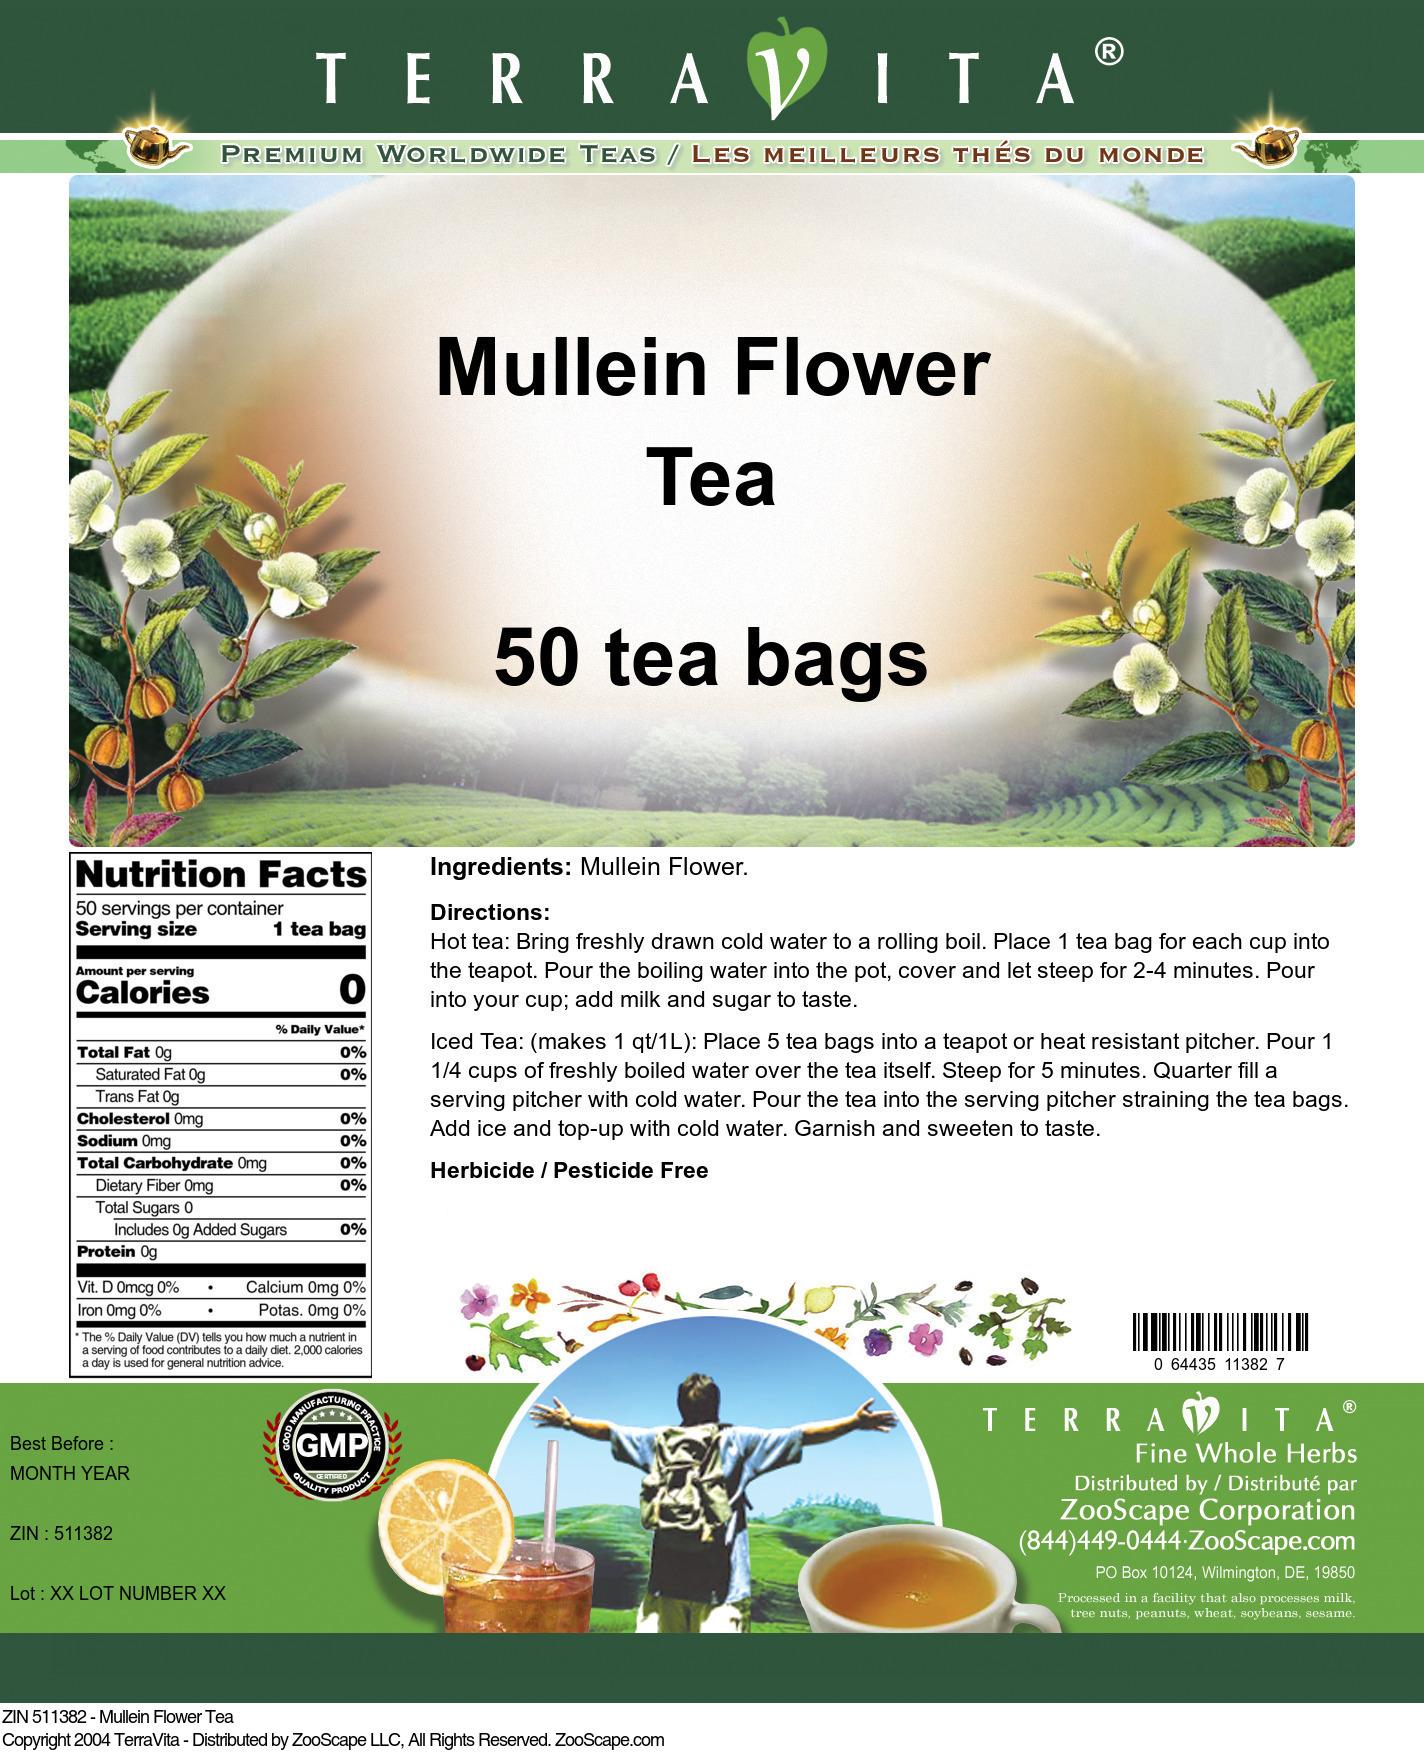 Mullein Flower Tea